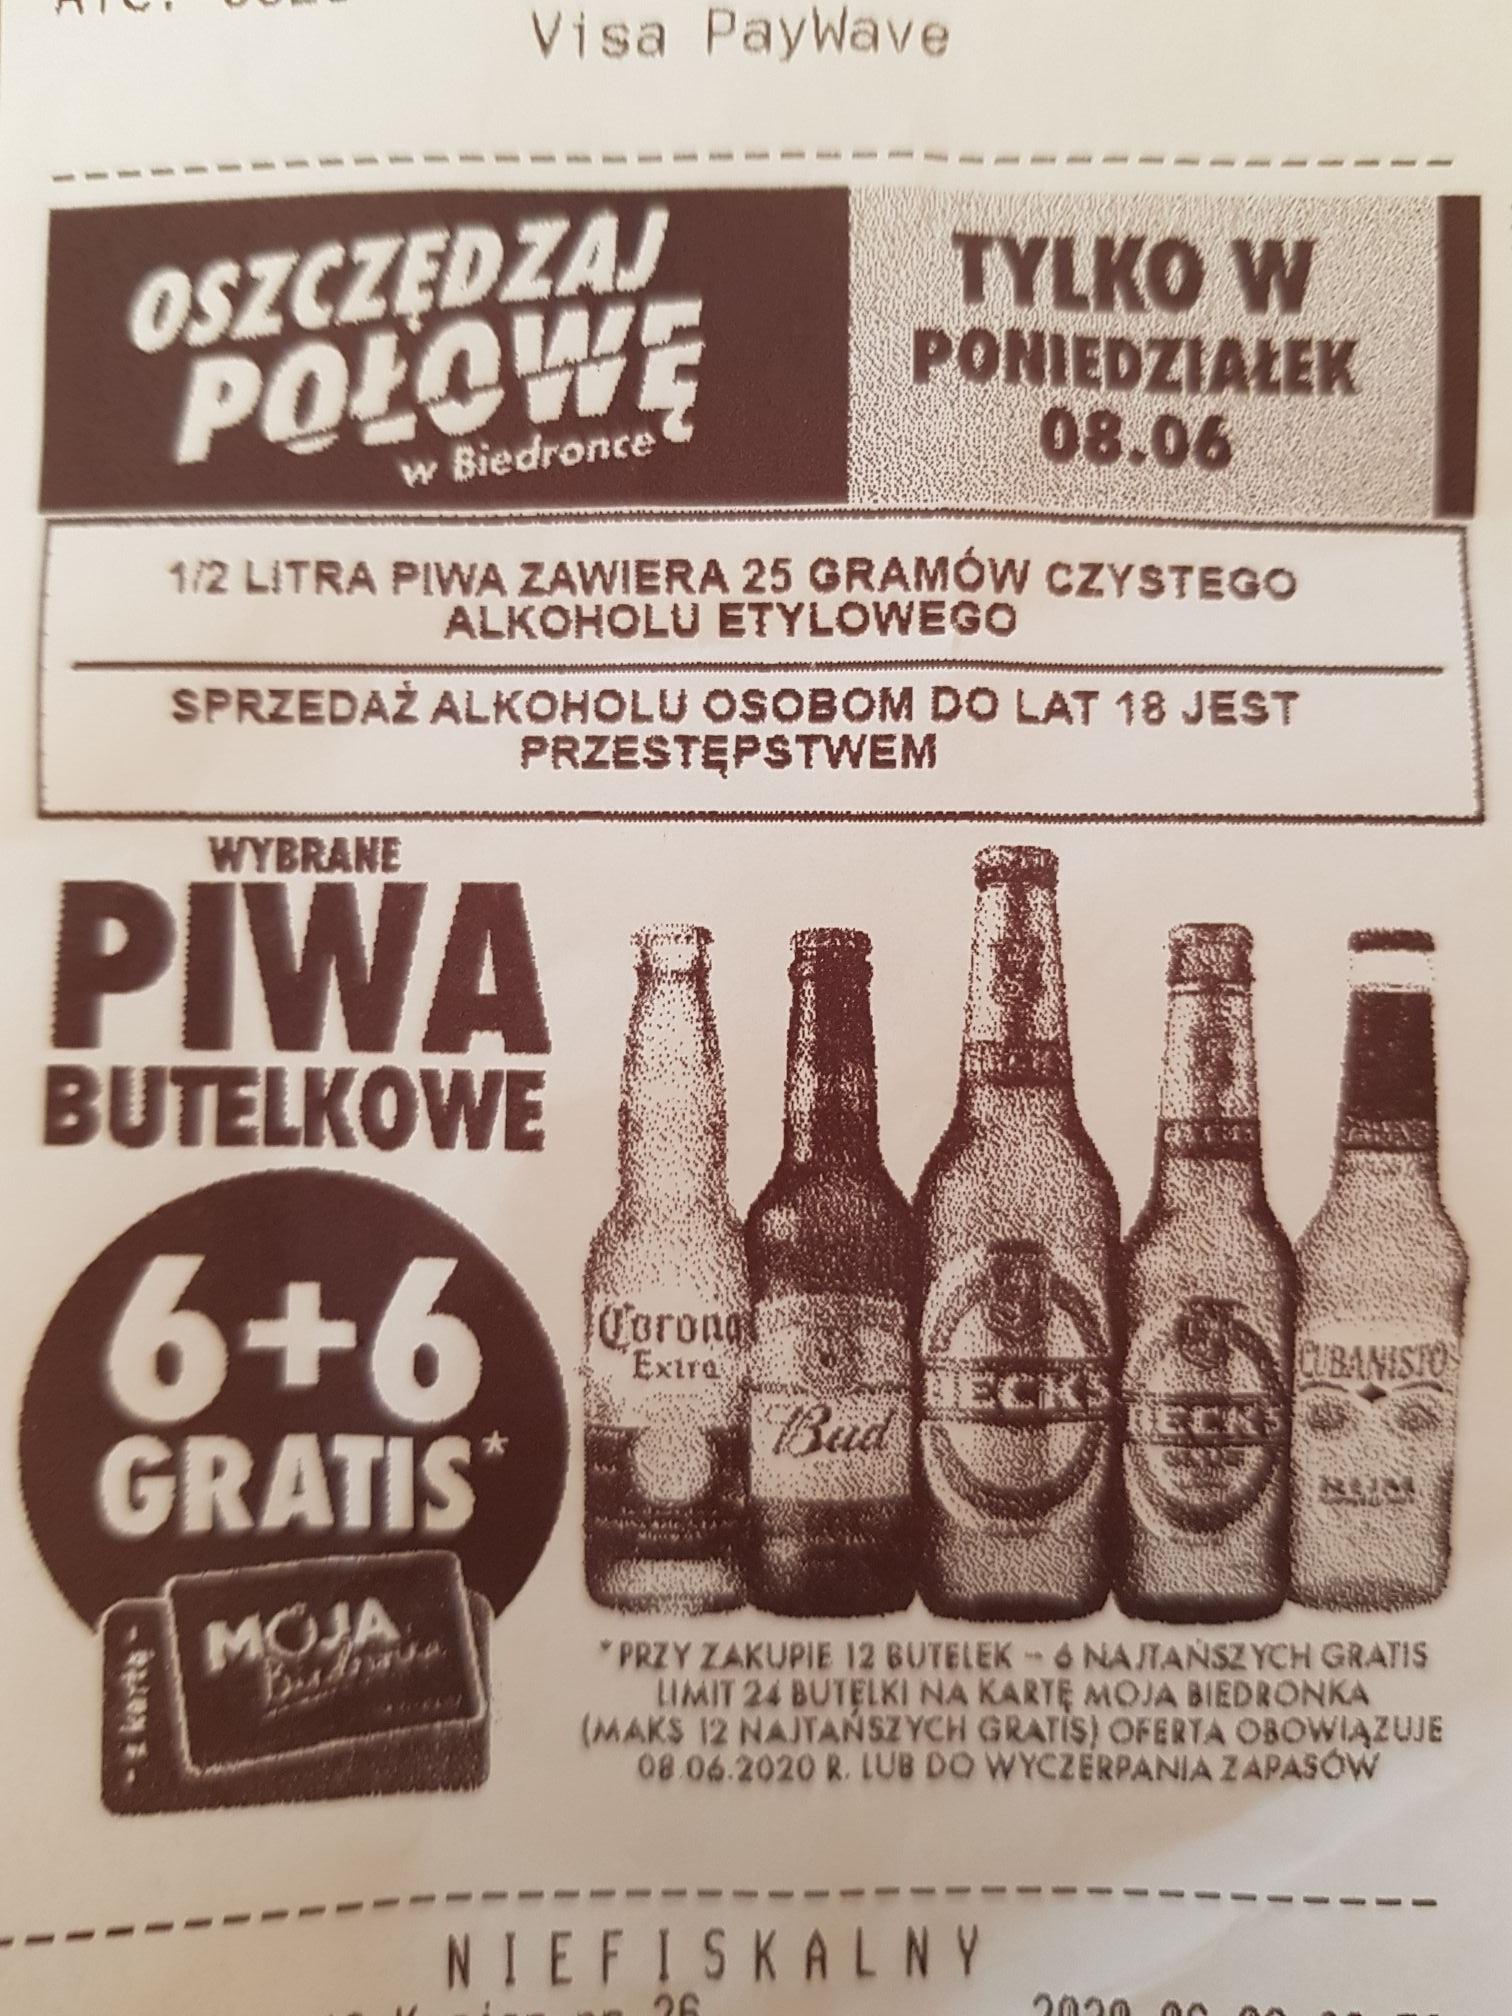 Wybrane piwa butelkowe 6+6 gratis. Biedronka.